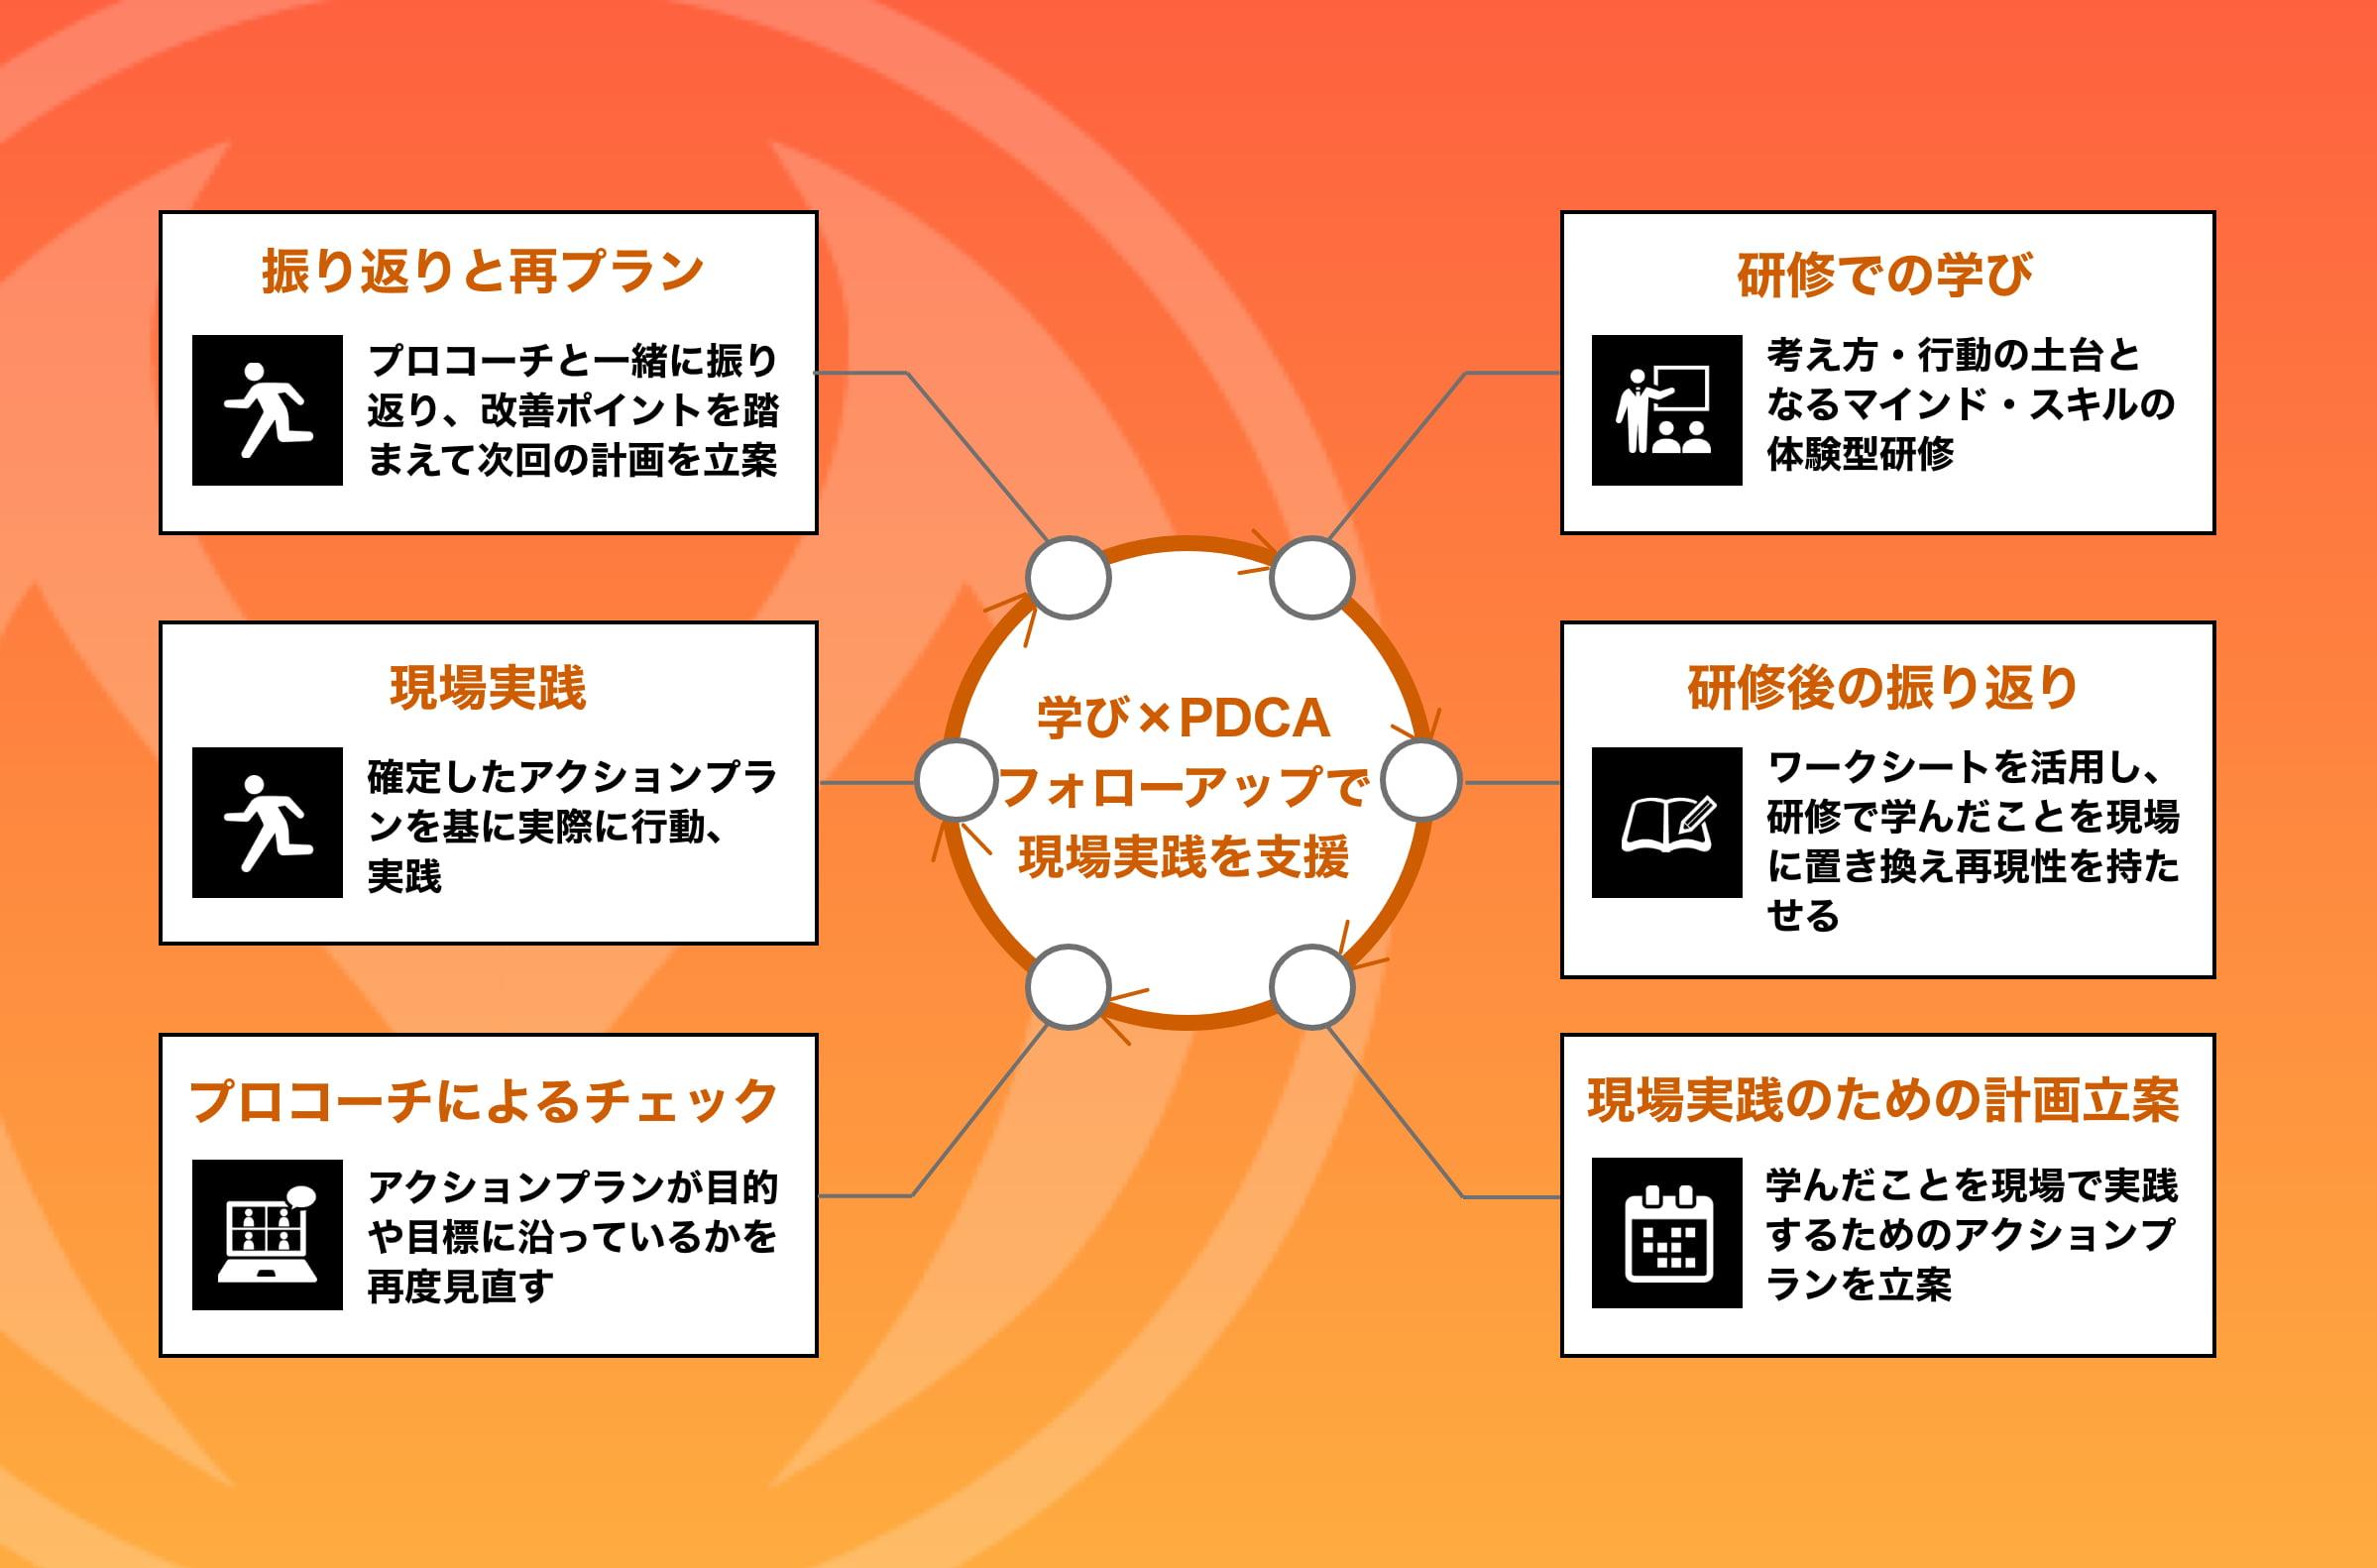 PDCA(計画→実行→振り返り→改善)の図